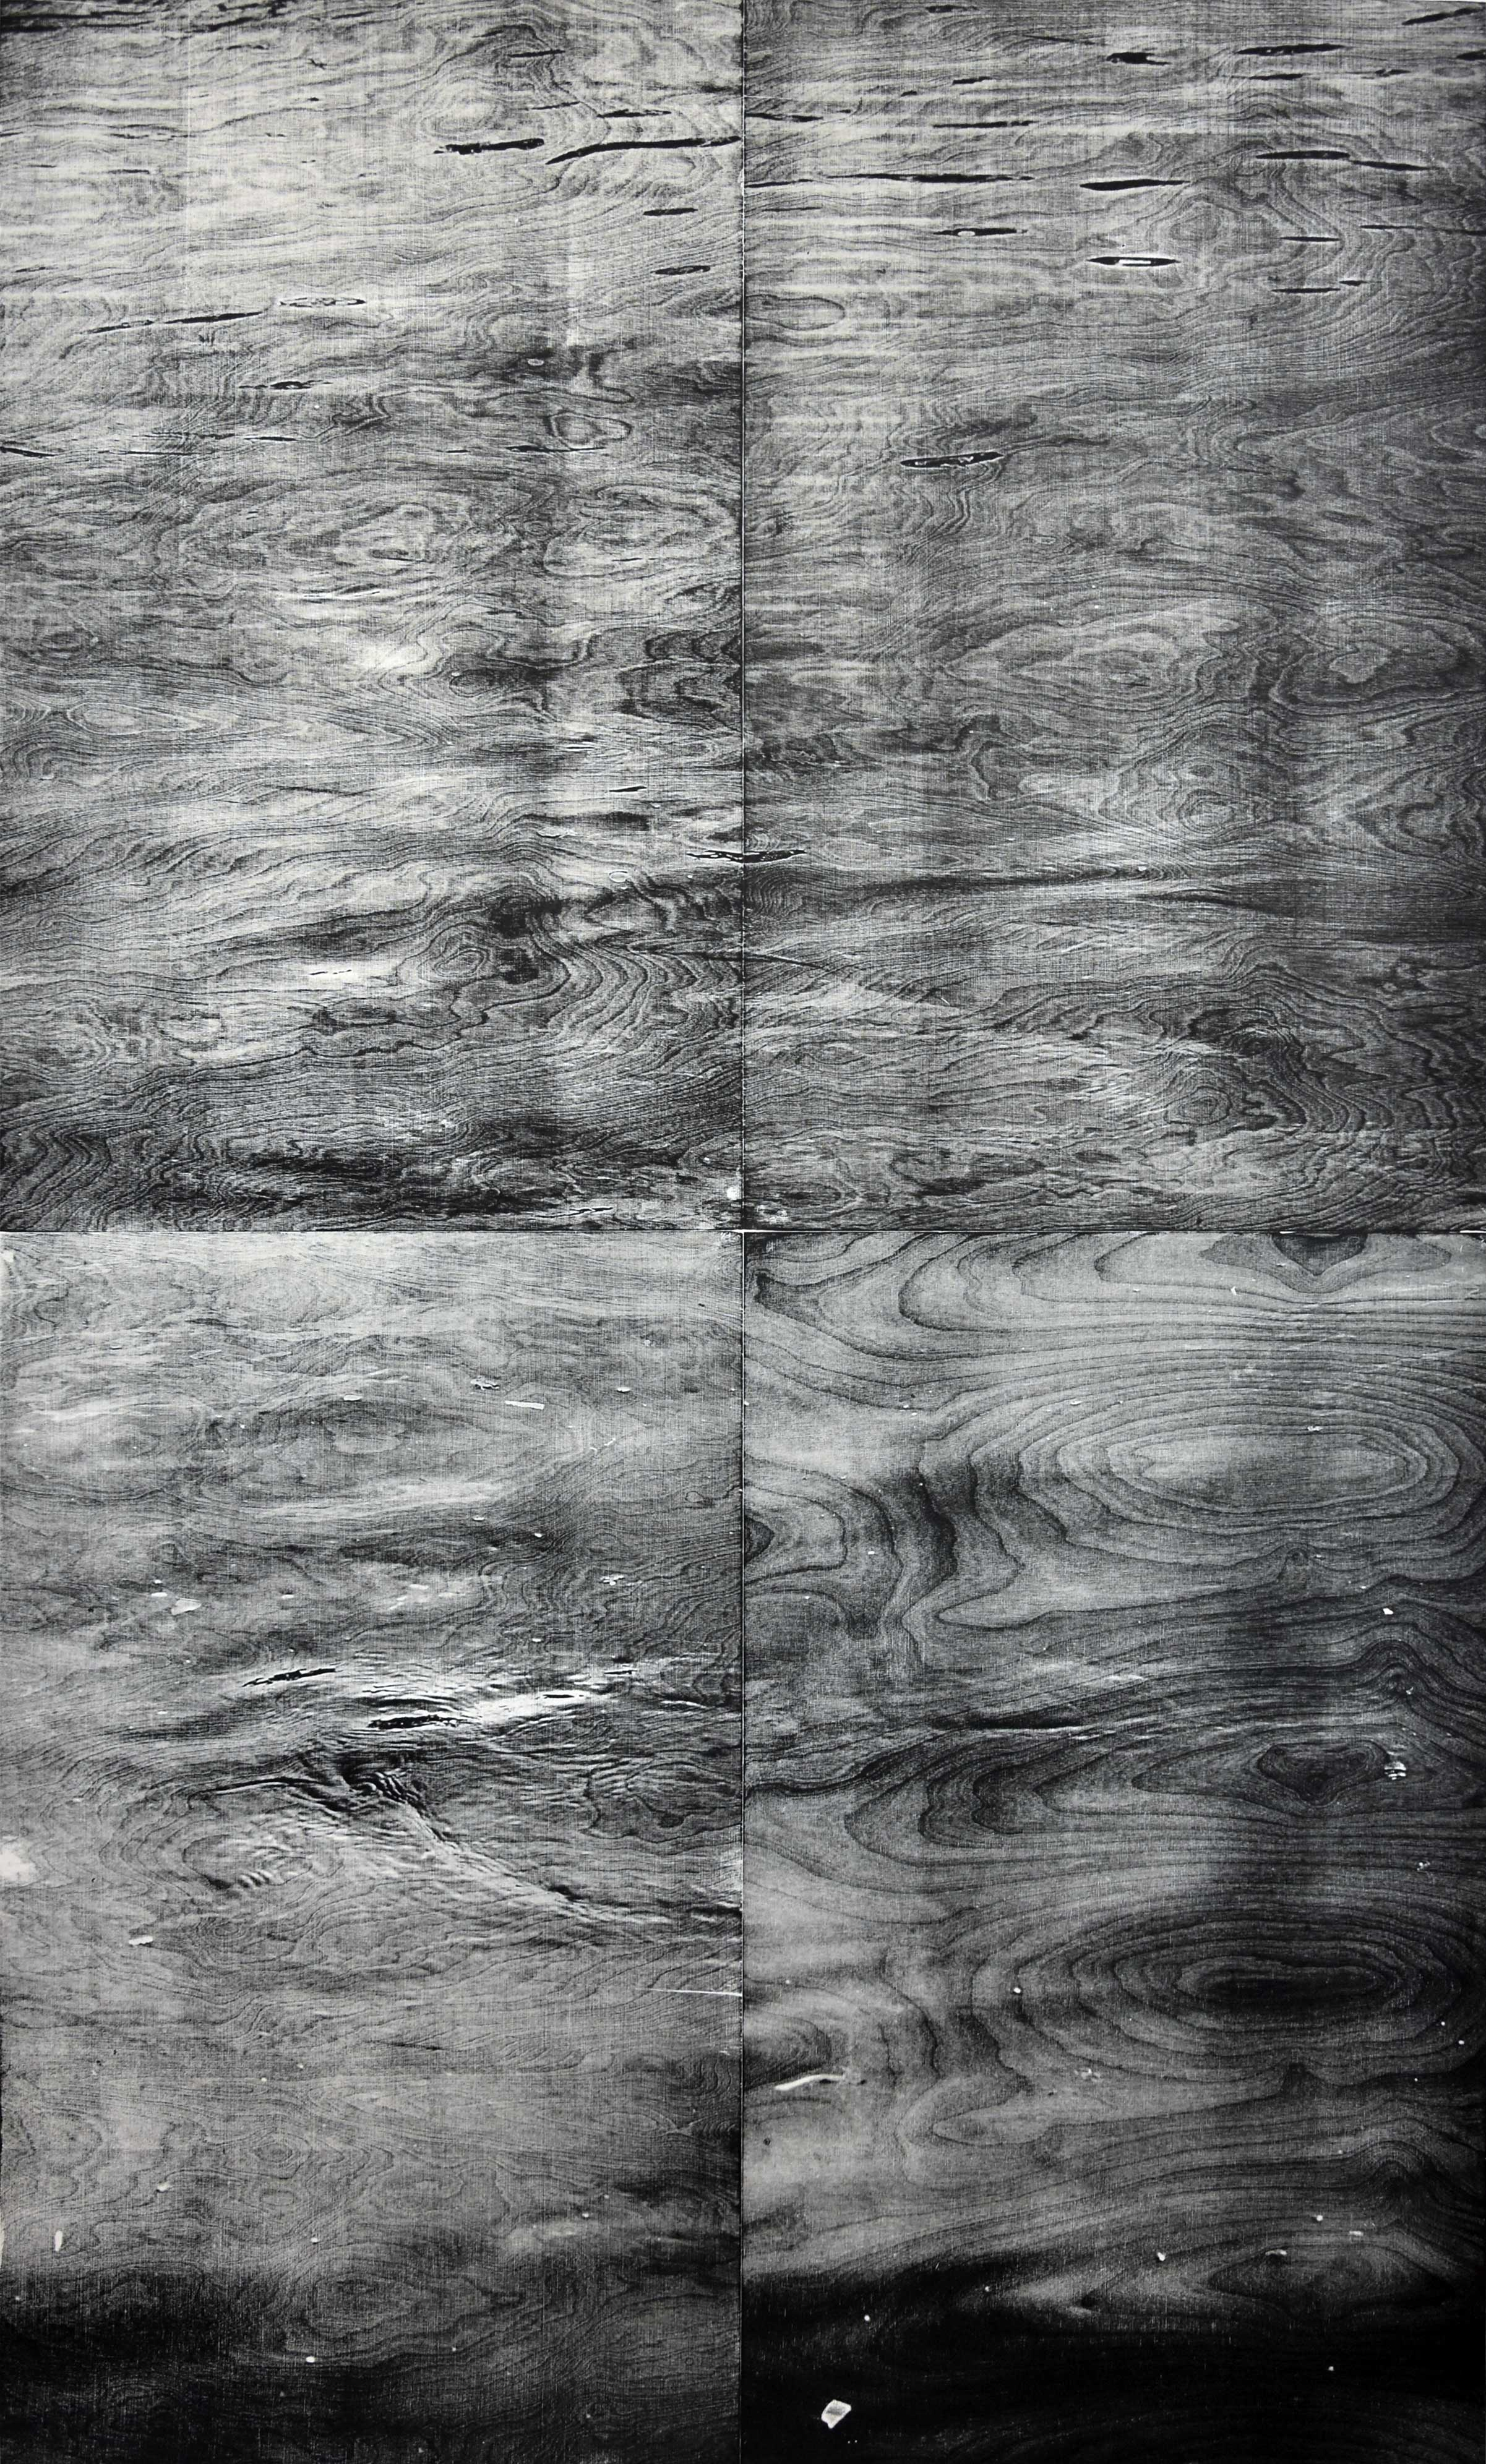 """Rhein I""; woodcut, laserphotography; 199,2x120,1cm; 2018 Genaro Strobel"